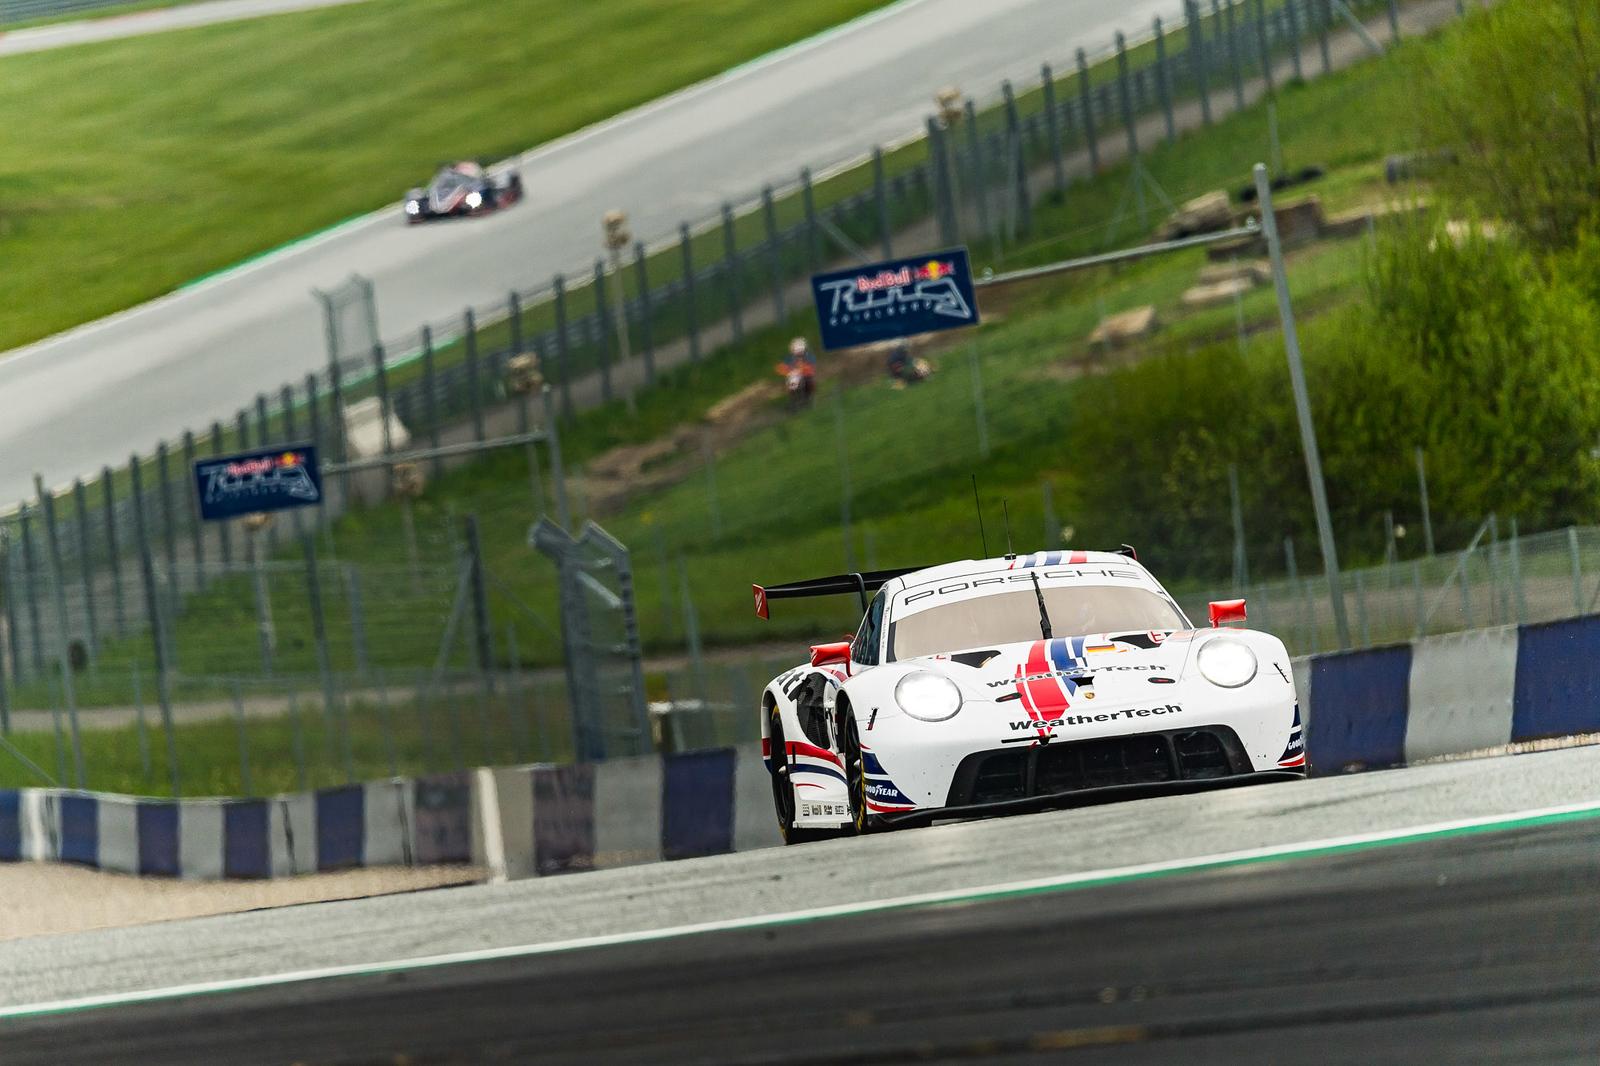 Porsche rounding another turn.